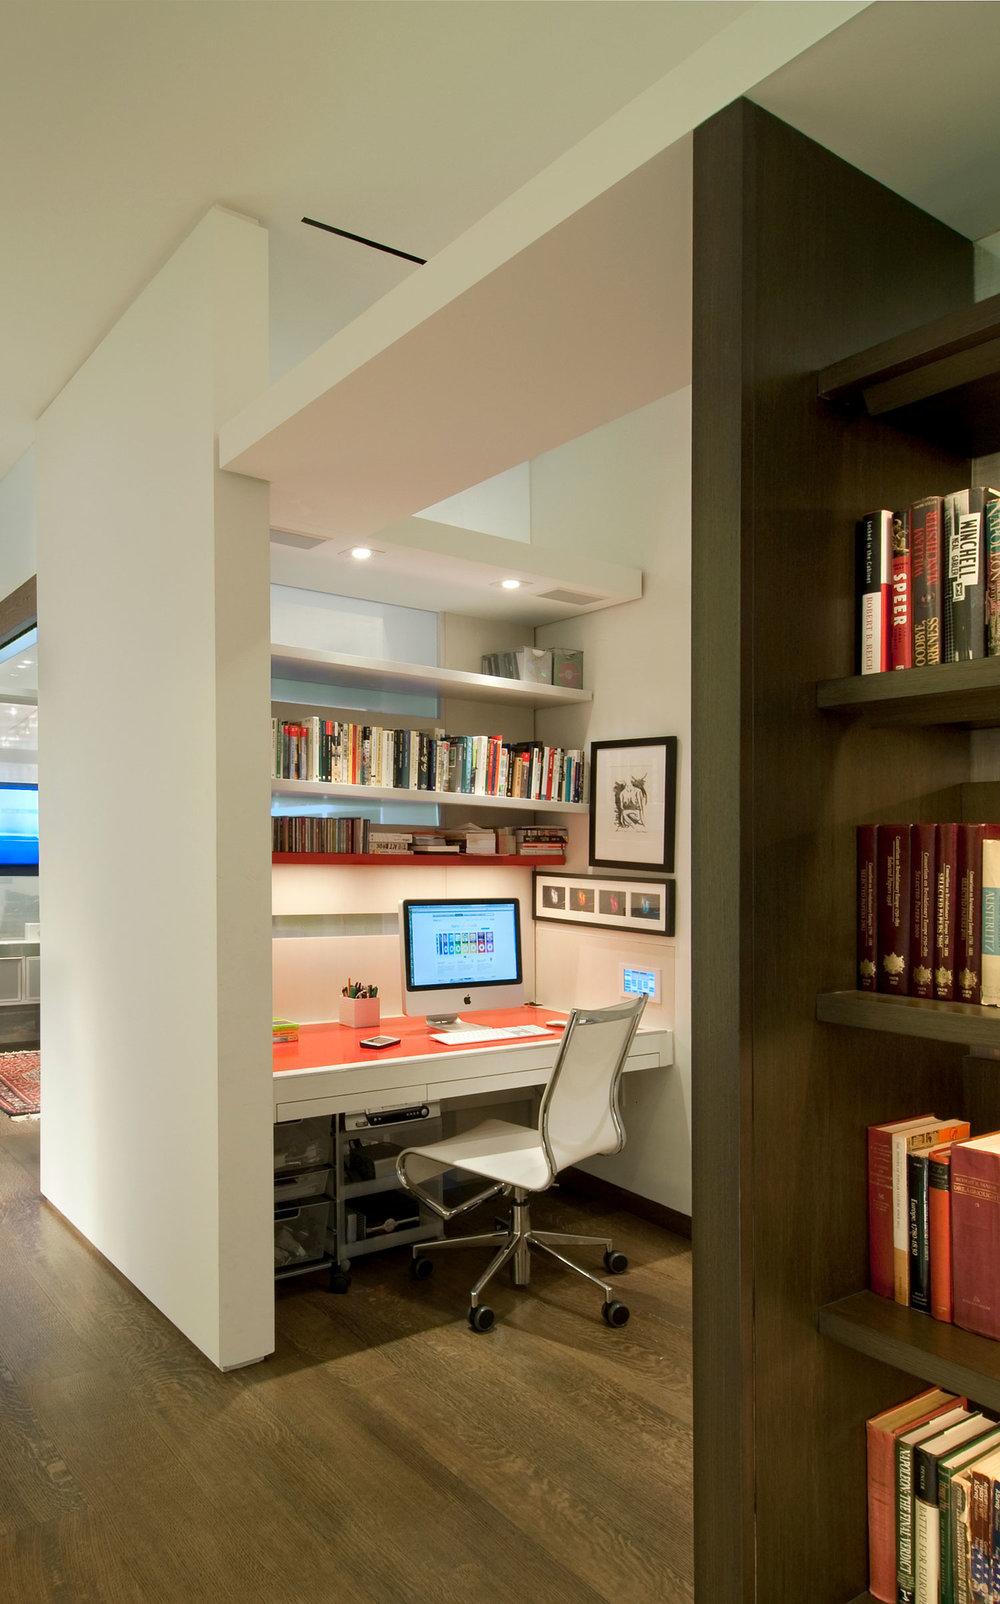 NYC Loft Renovation - Home office